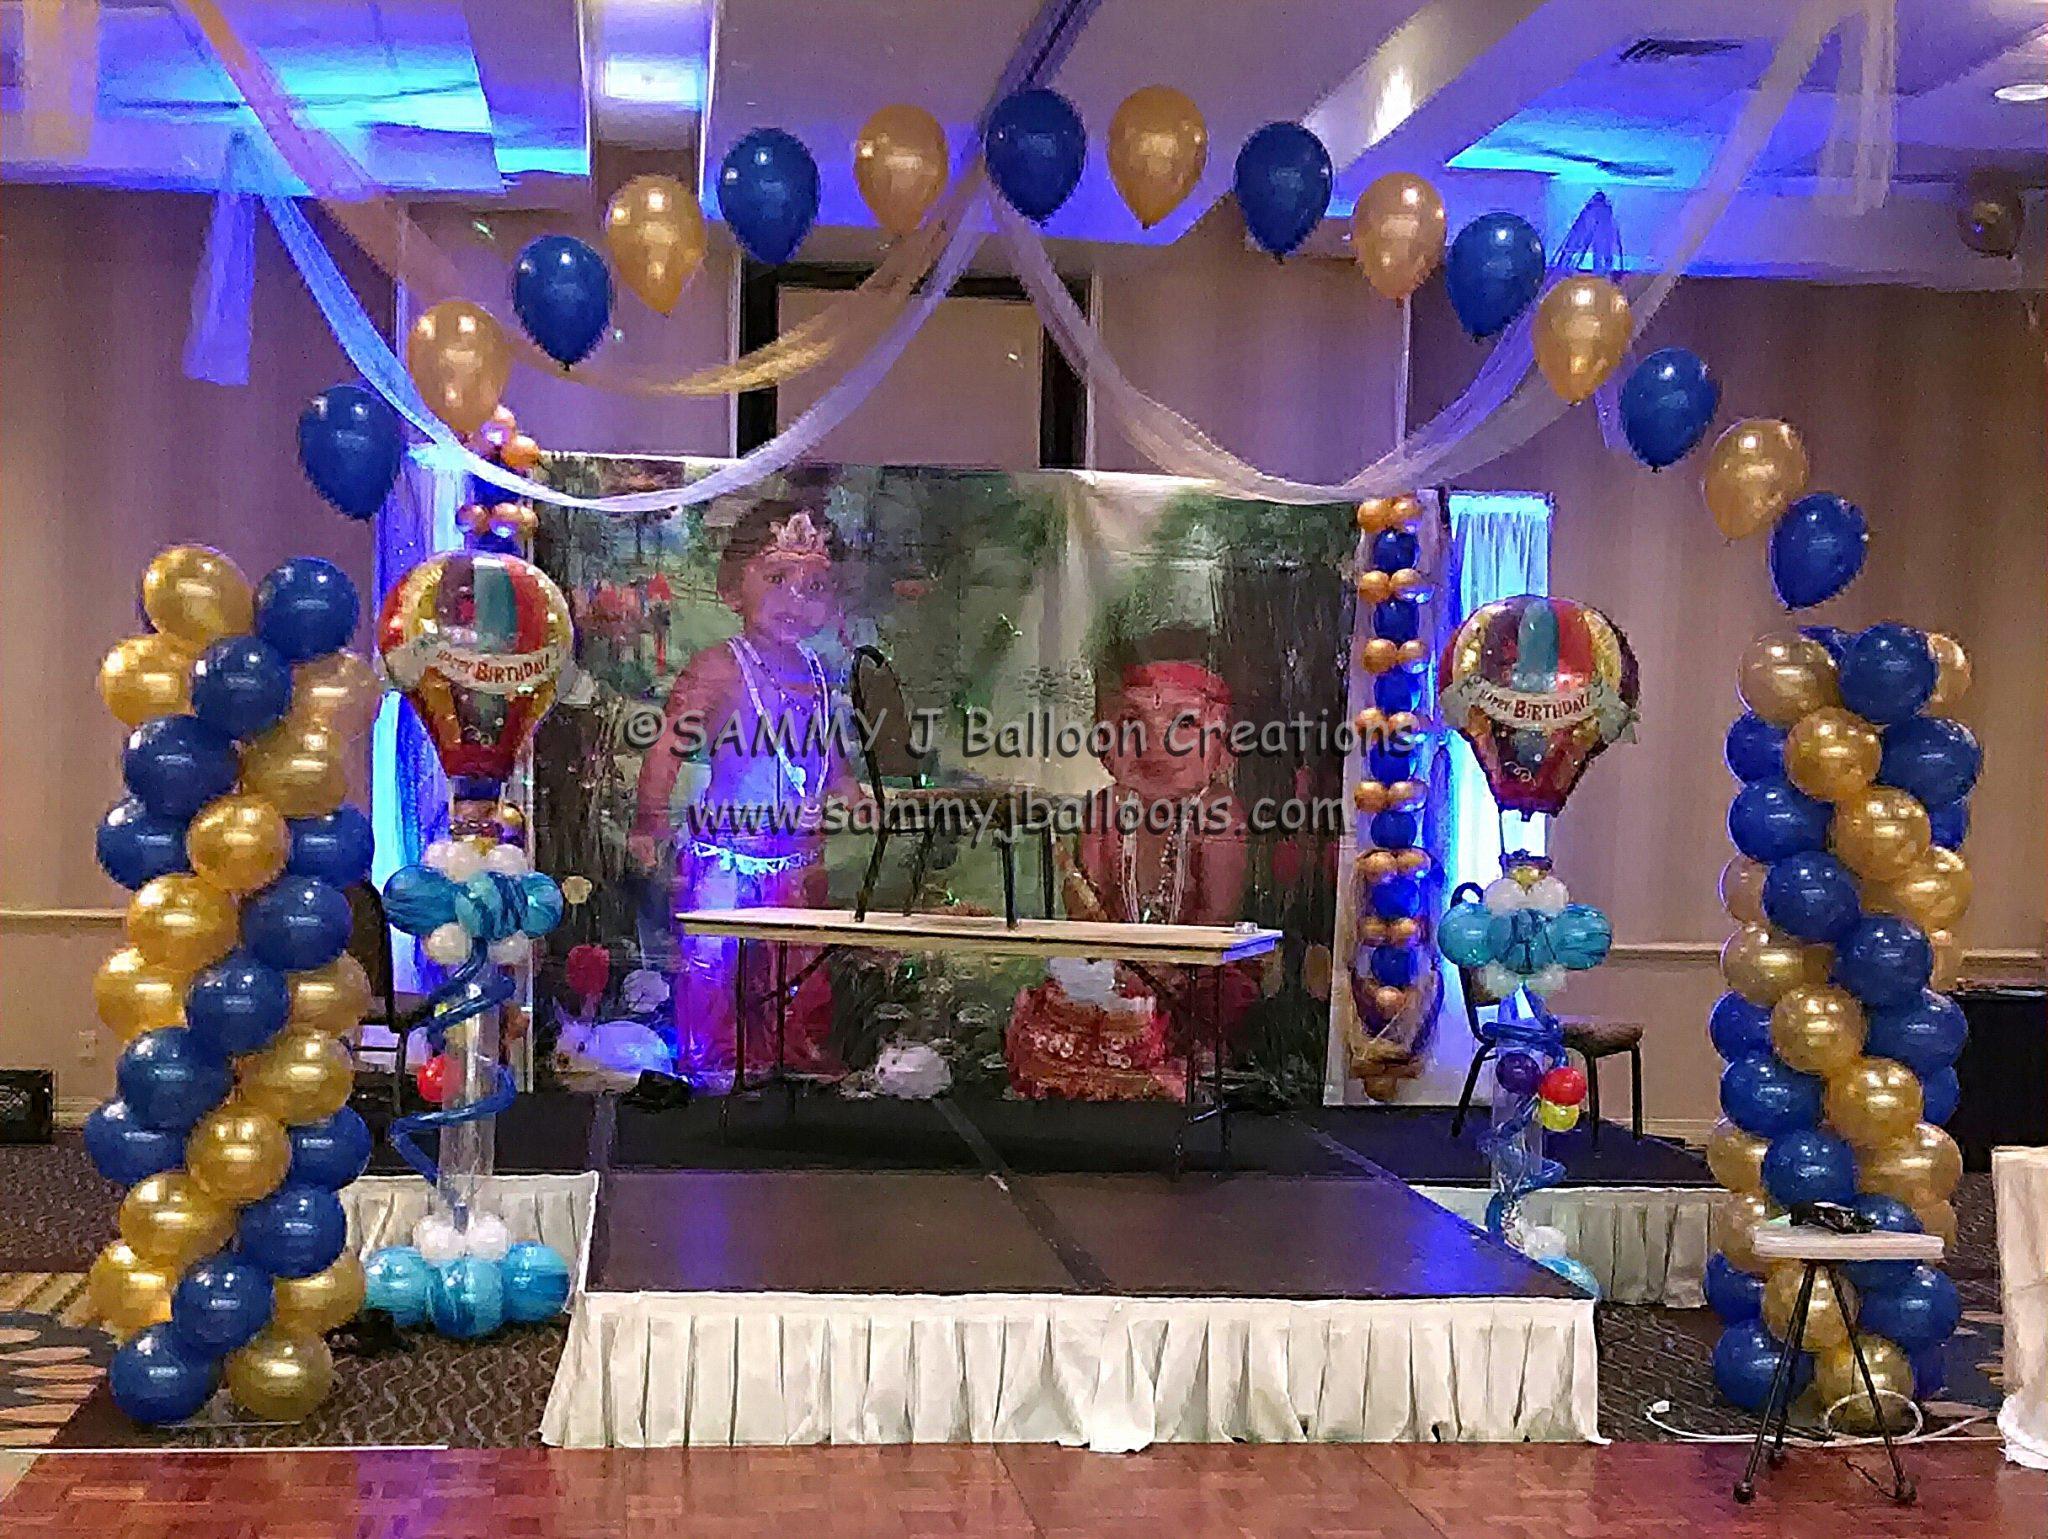 SAMMY J Balloon Creations st louis balloons stage decor column arch